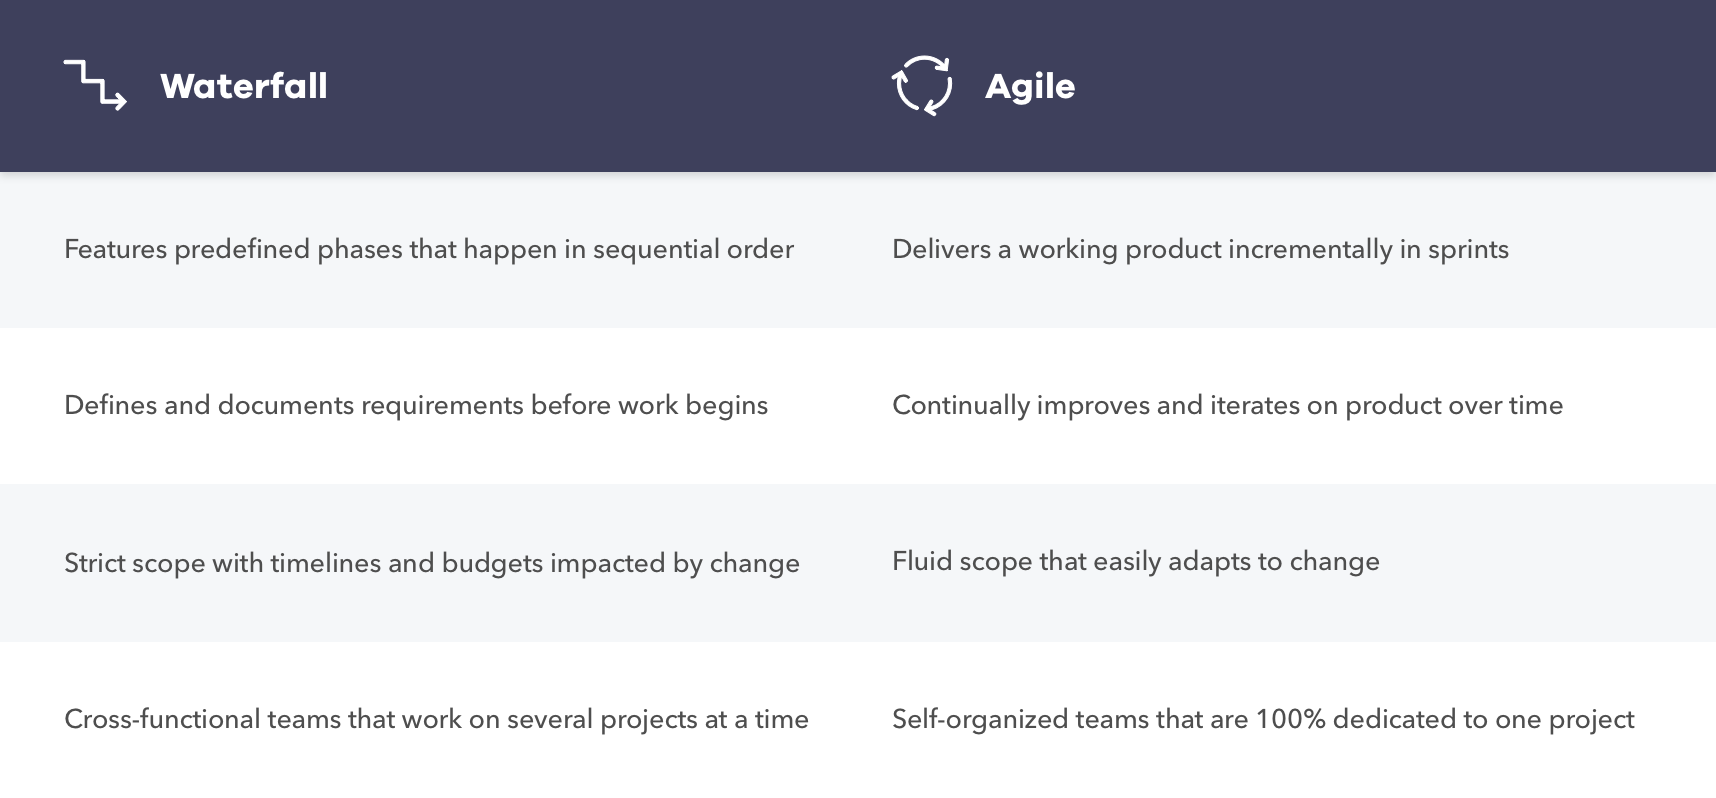 Differences between the Waterfall vs. Agile methodologies